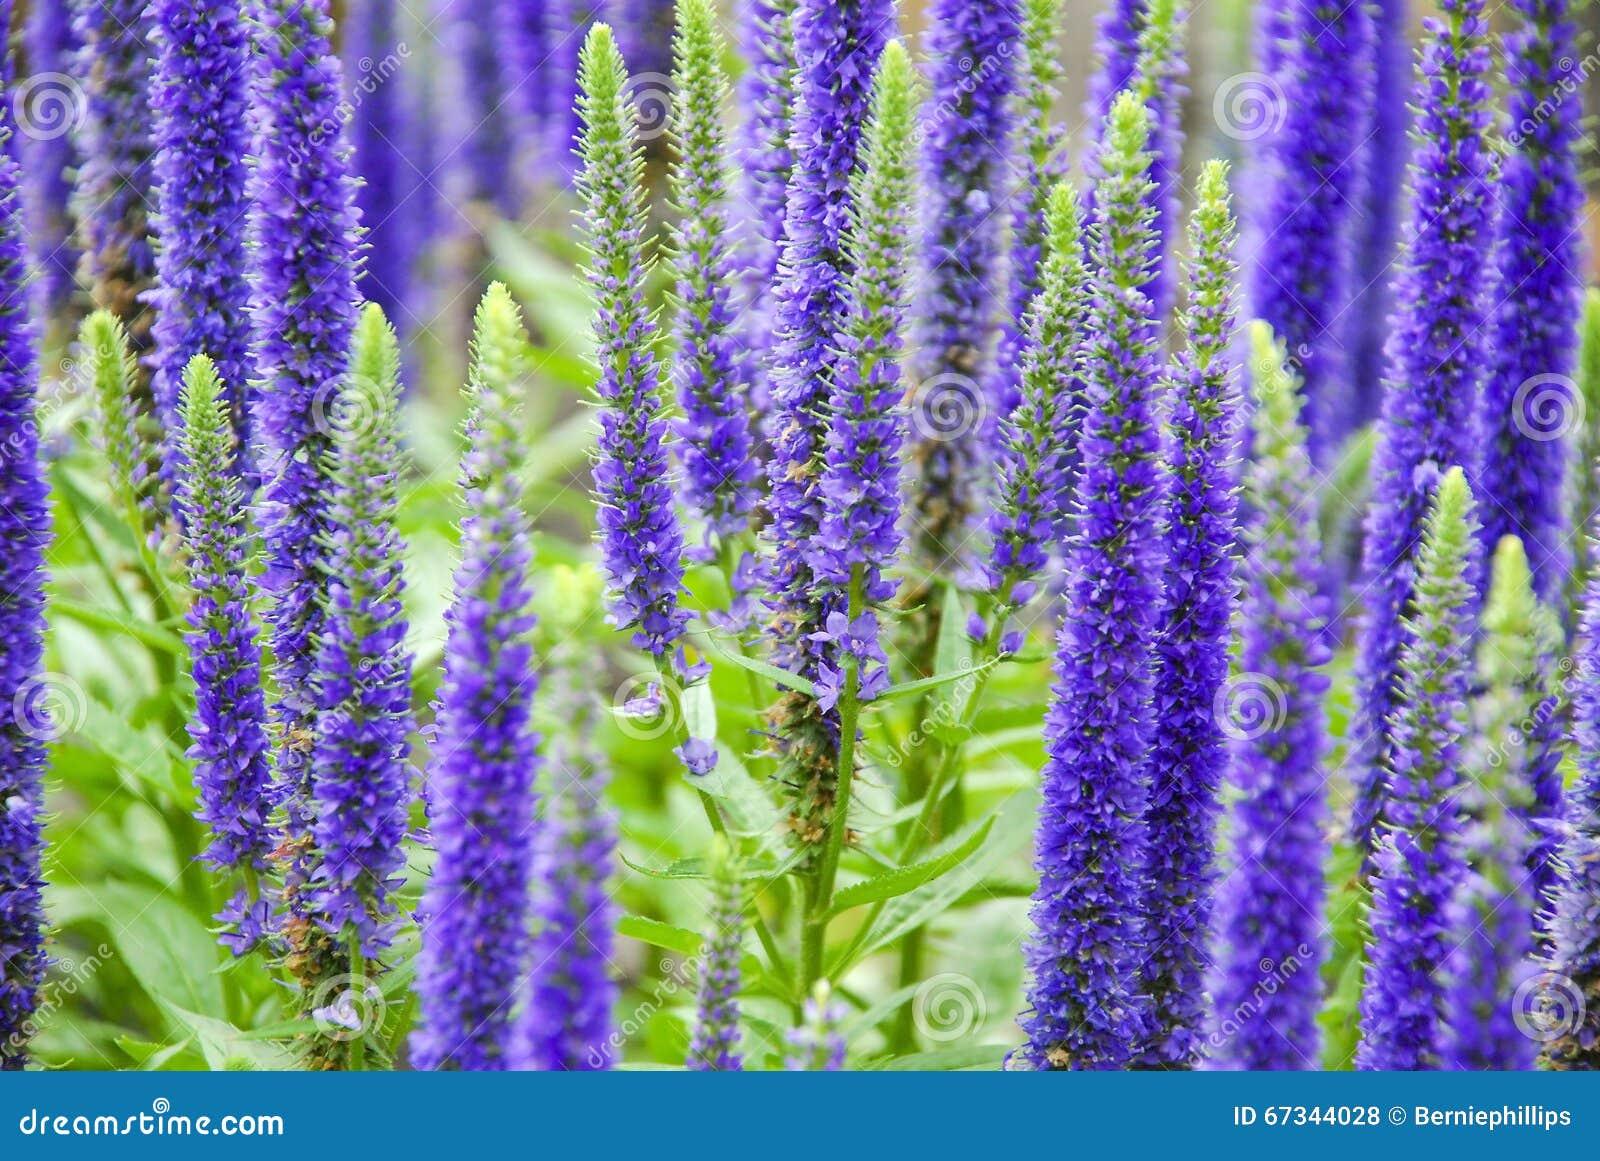 Tall fall perennial flowers home design purple spring flowers stock photo image 67344028 mightylinksfo